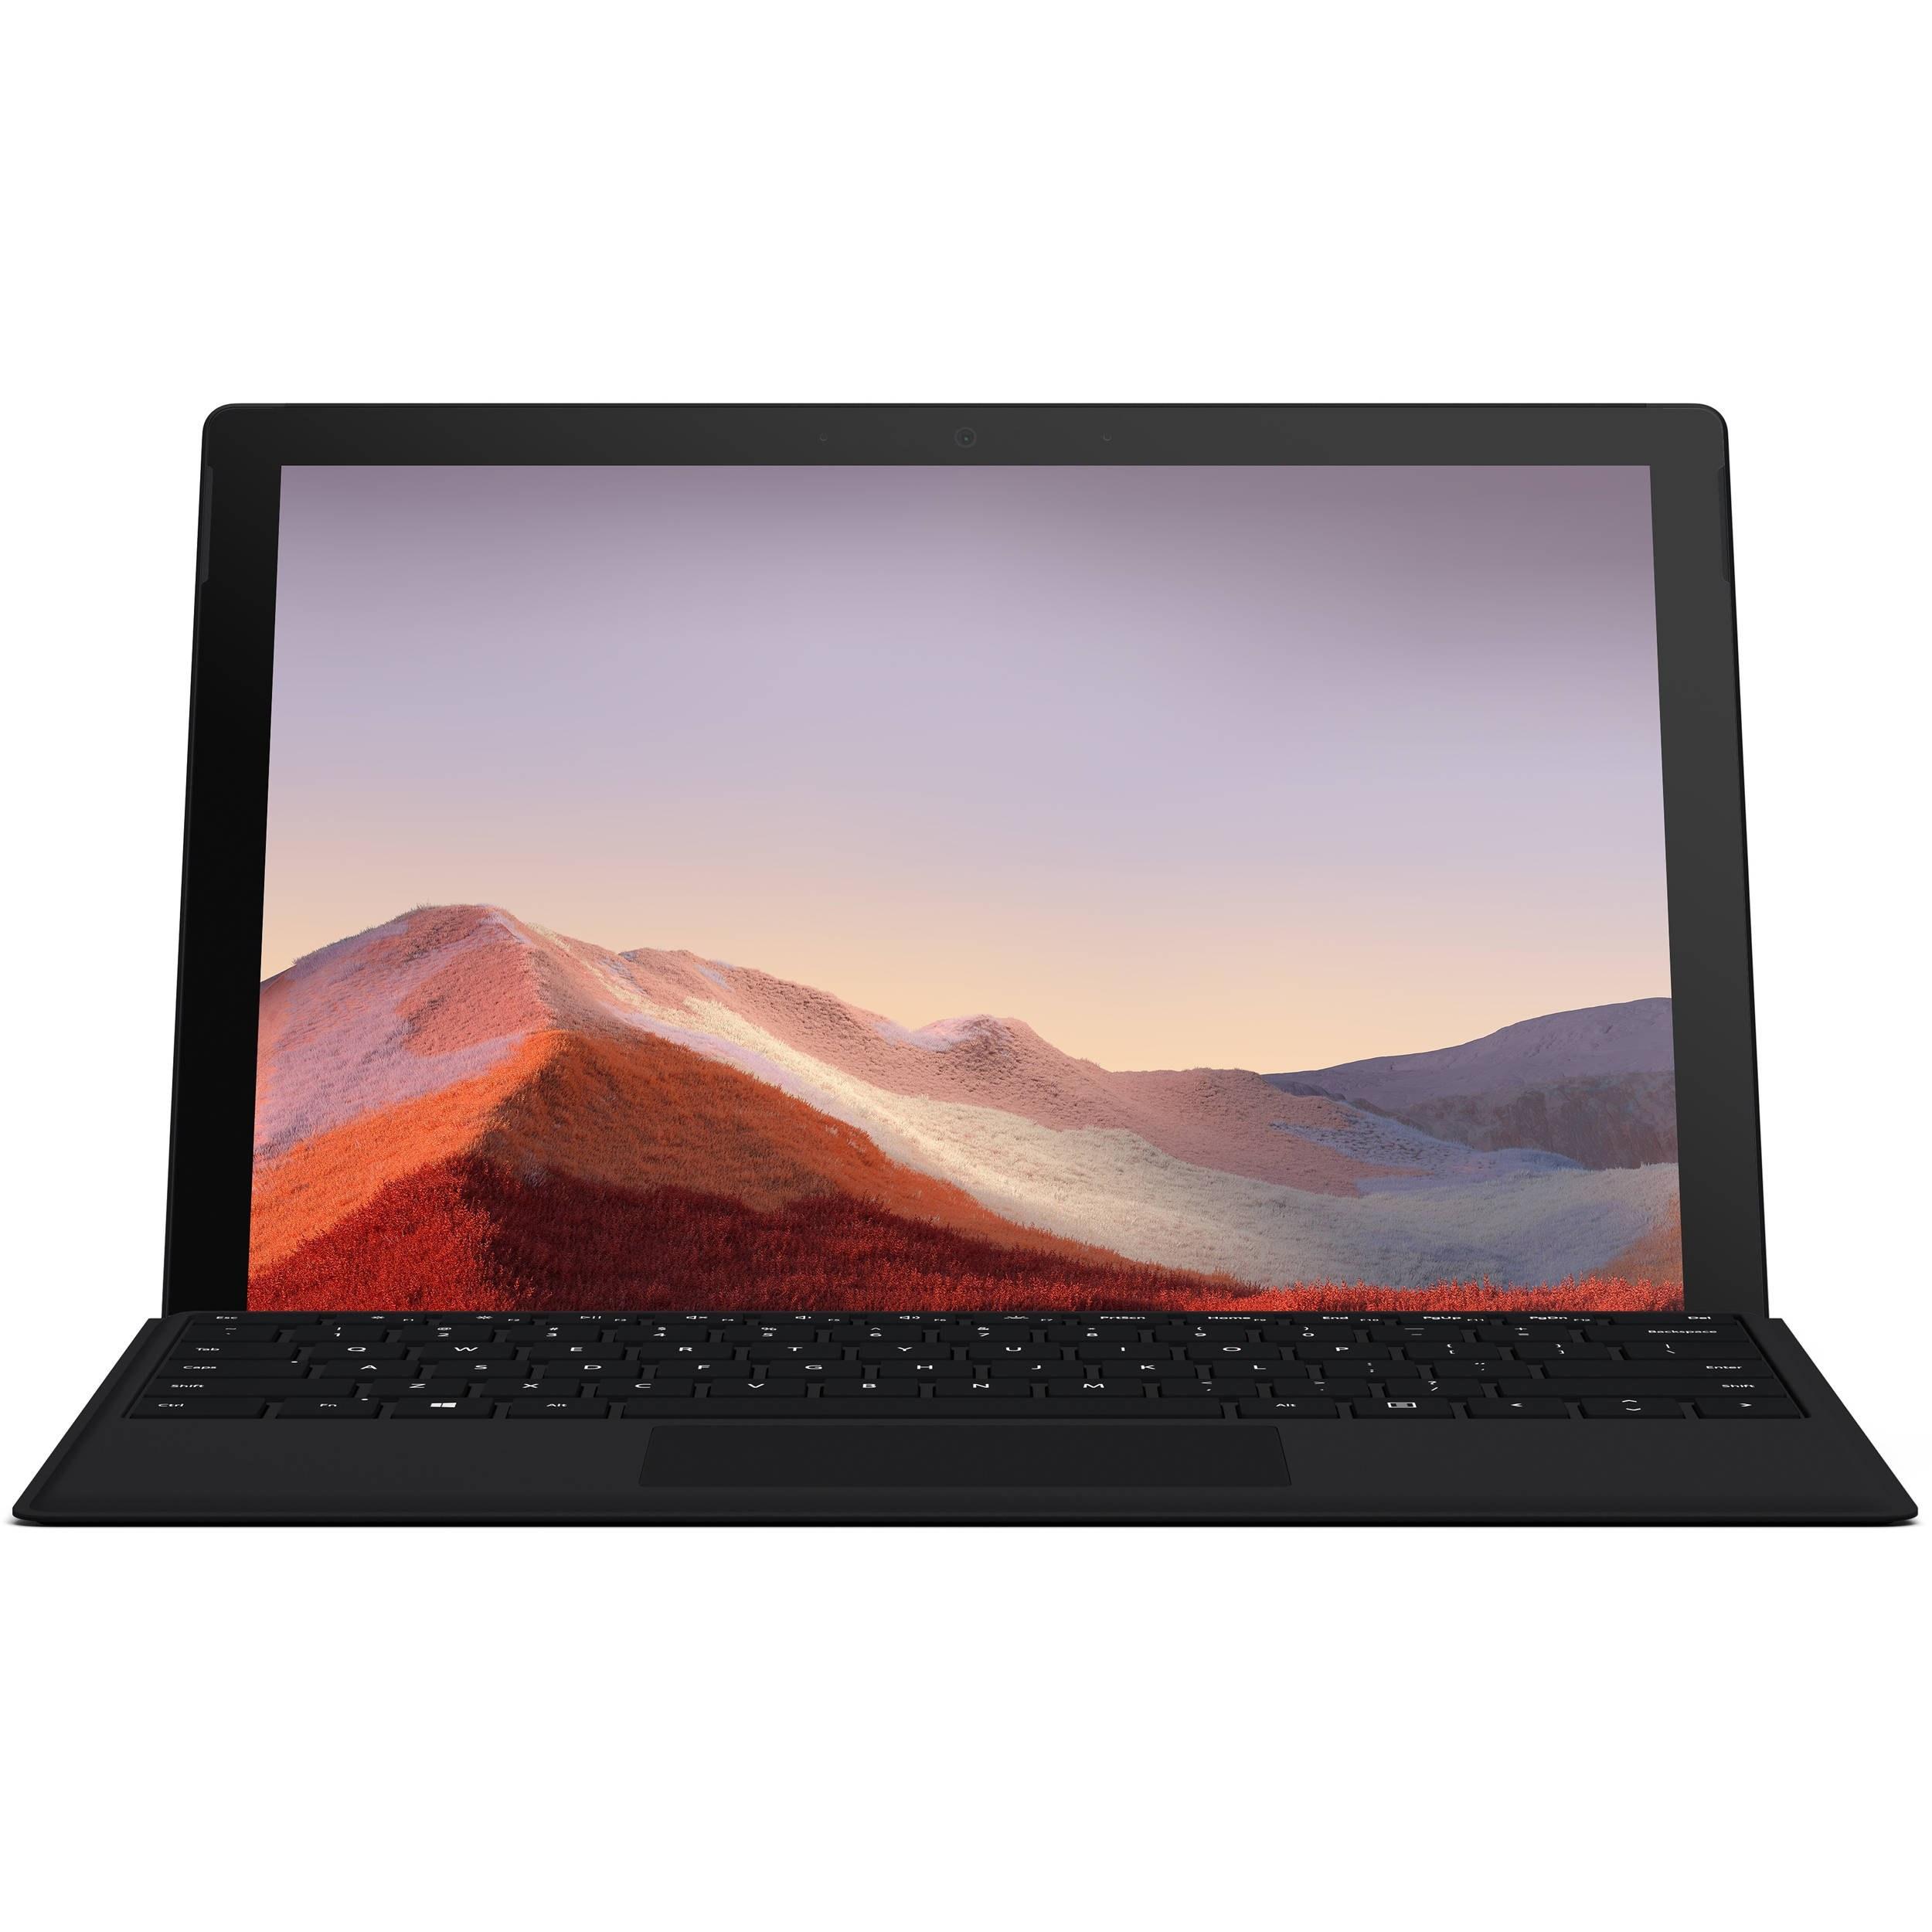 تصویر تبلت مایکروسافت مدل Surface Pro 7 - E به همراه کیبورد Black Type Cover Microsoft Surface Pro 7 - E - Tablet With Black Type Cover Keyboard